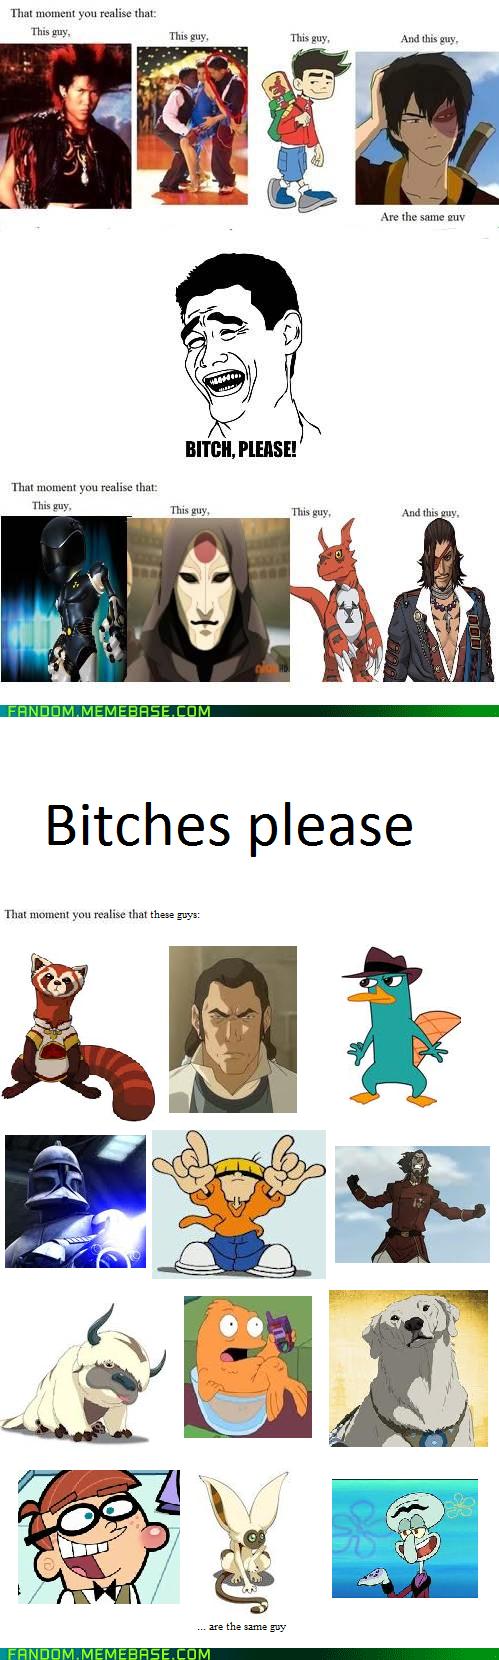 cartoons Fan Art Memes voice actors - 6468174336